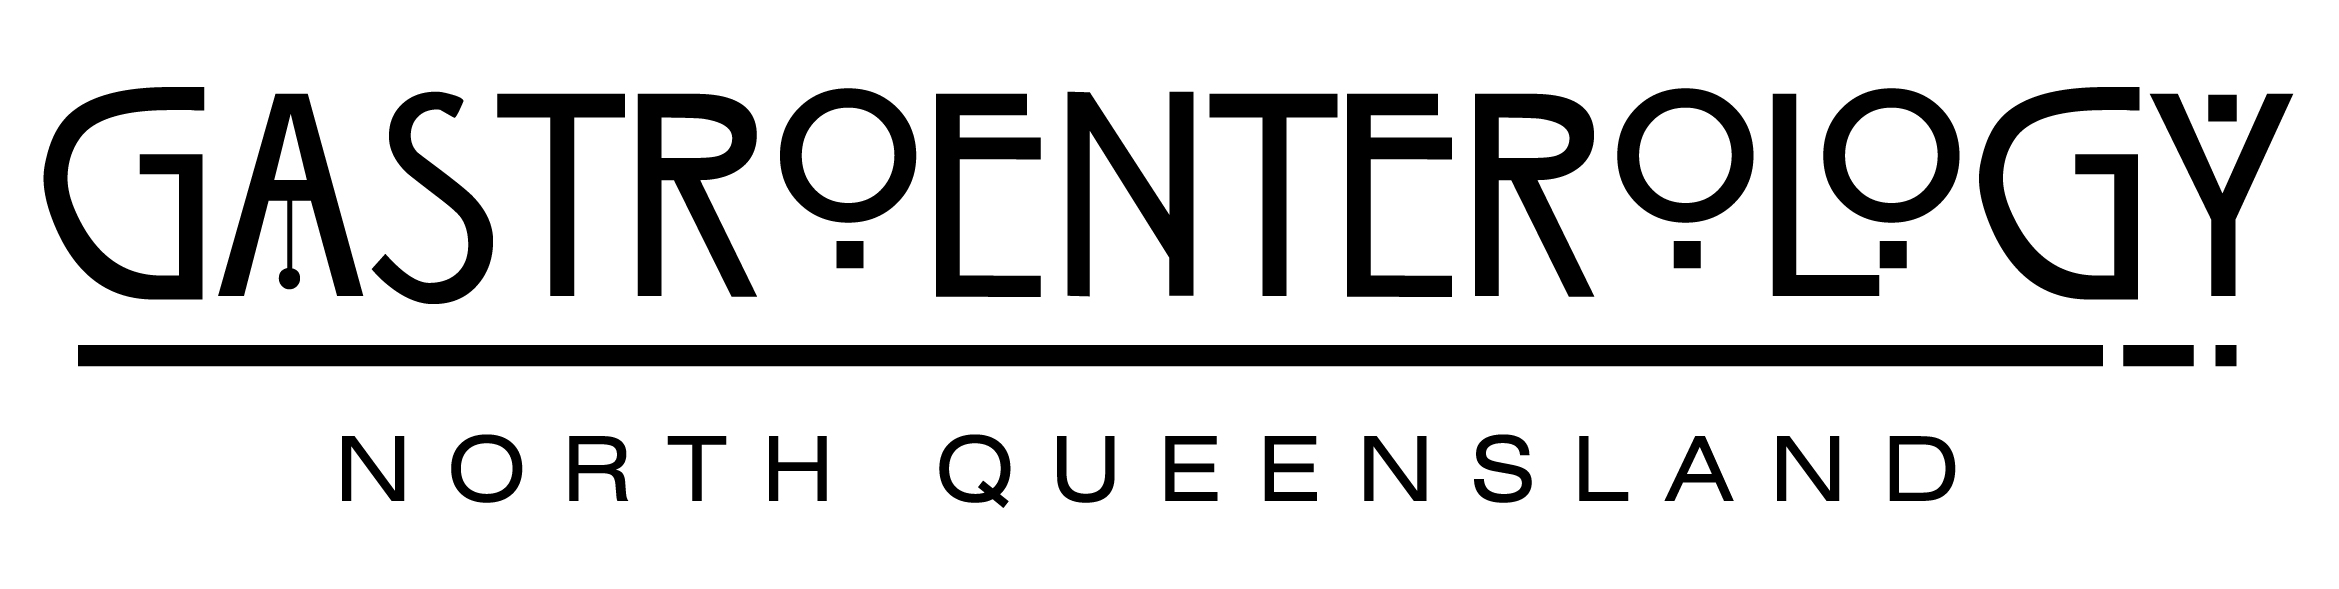 Gastrorenterology logo